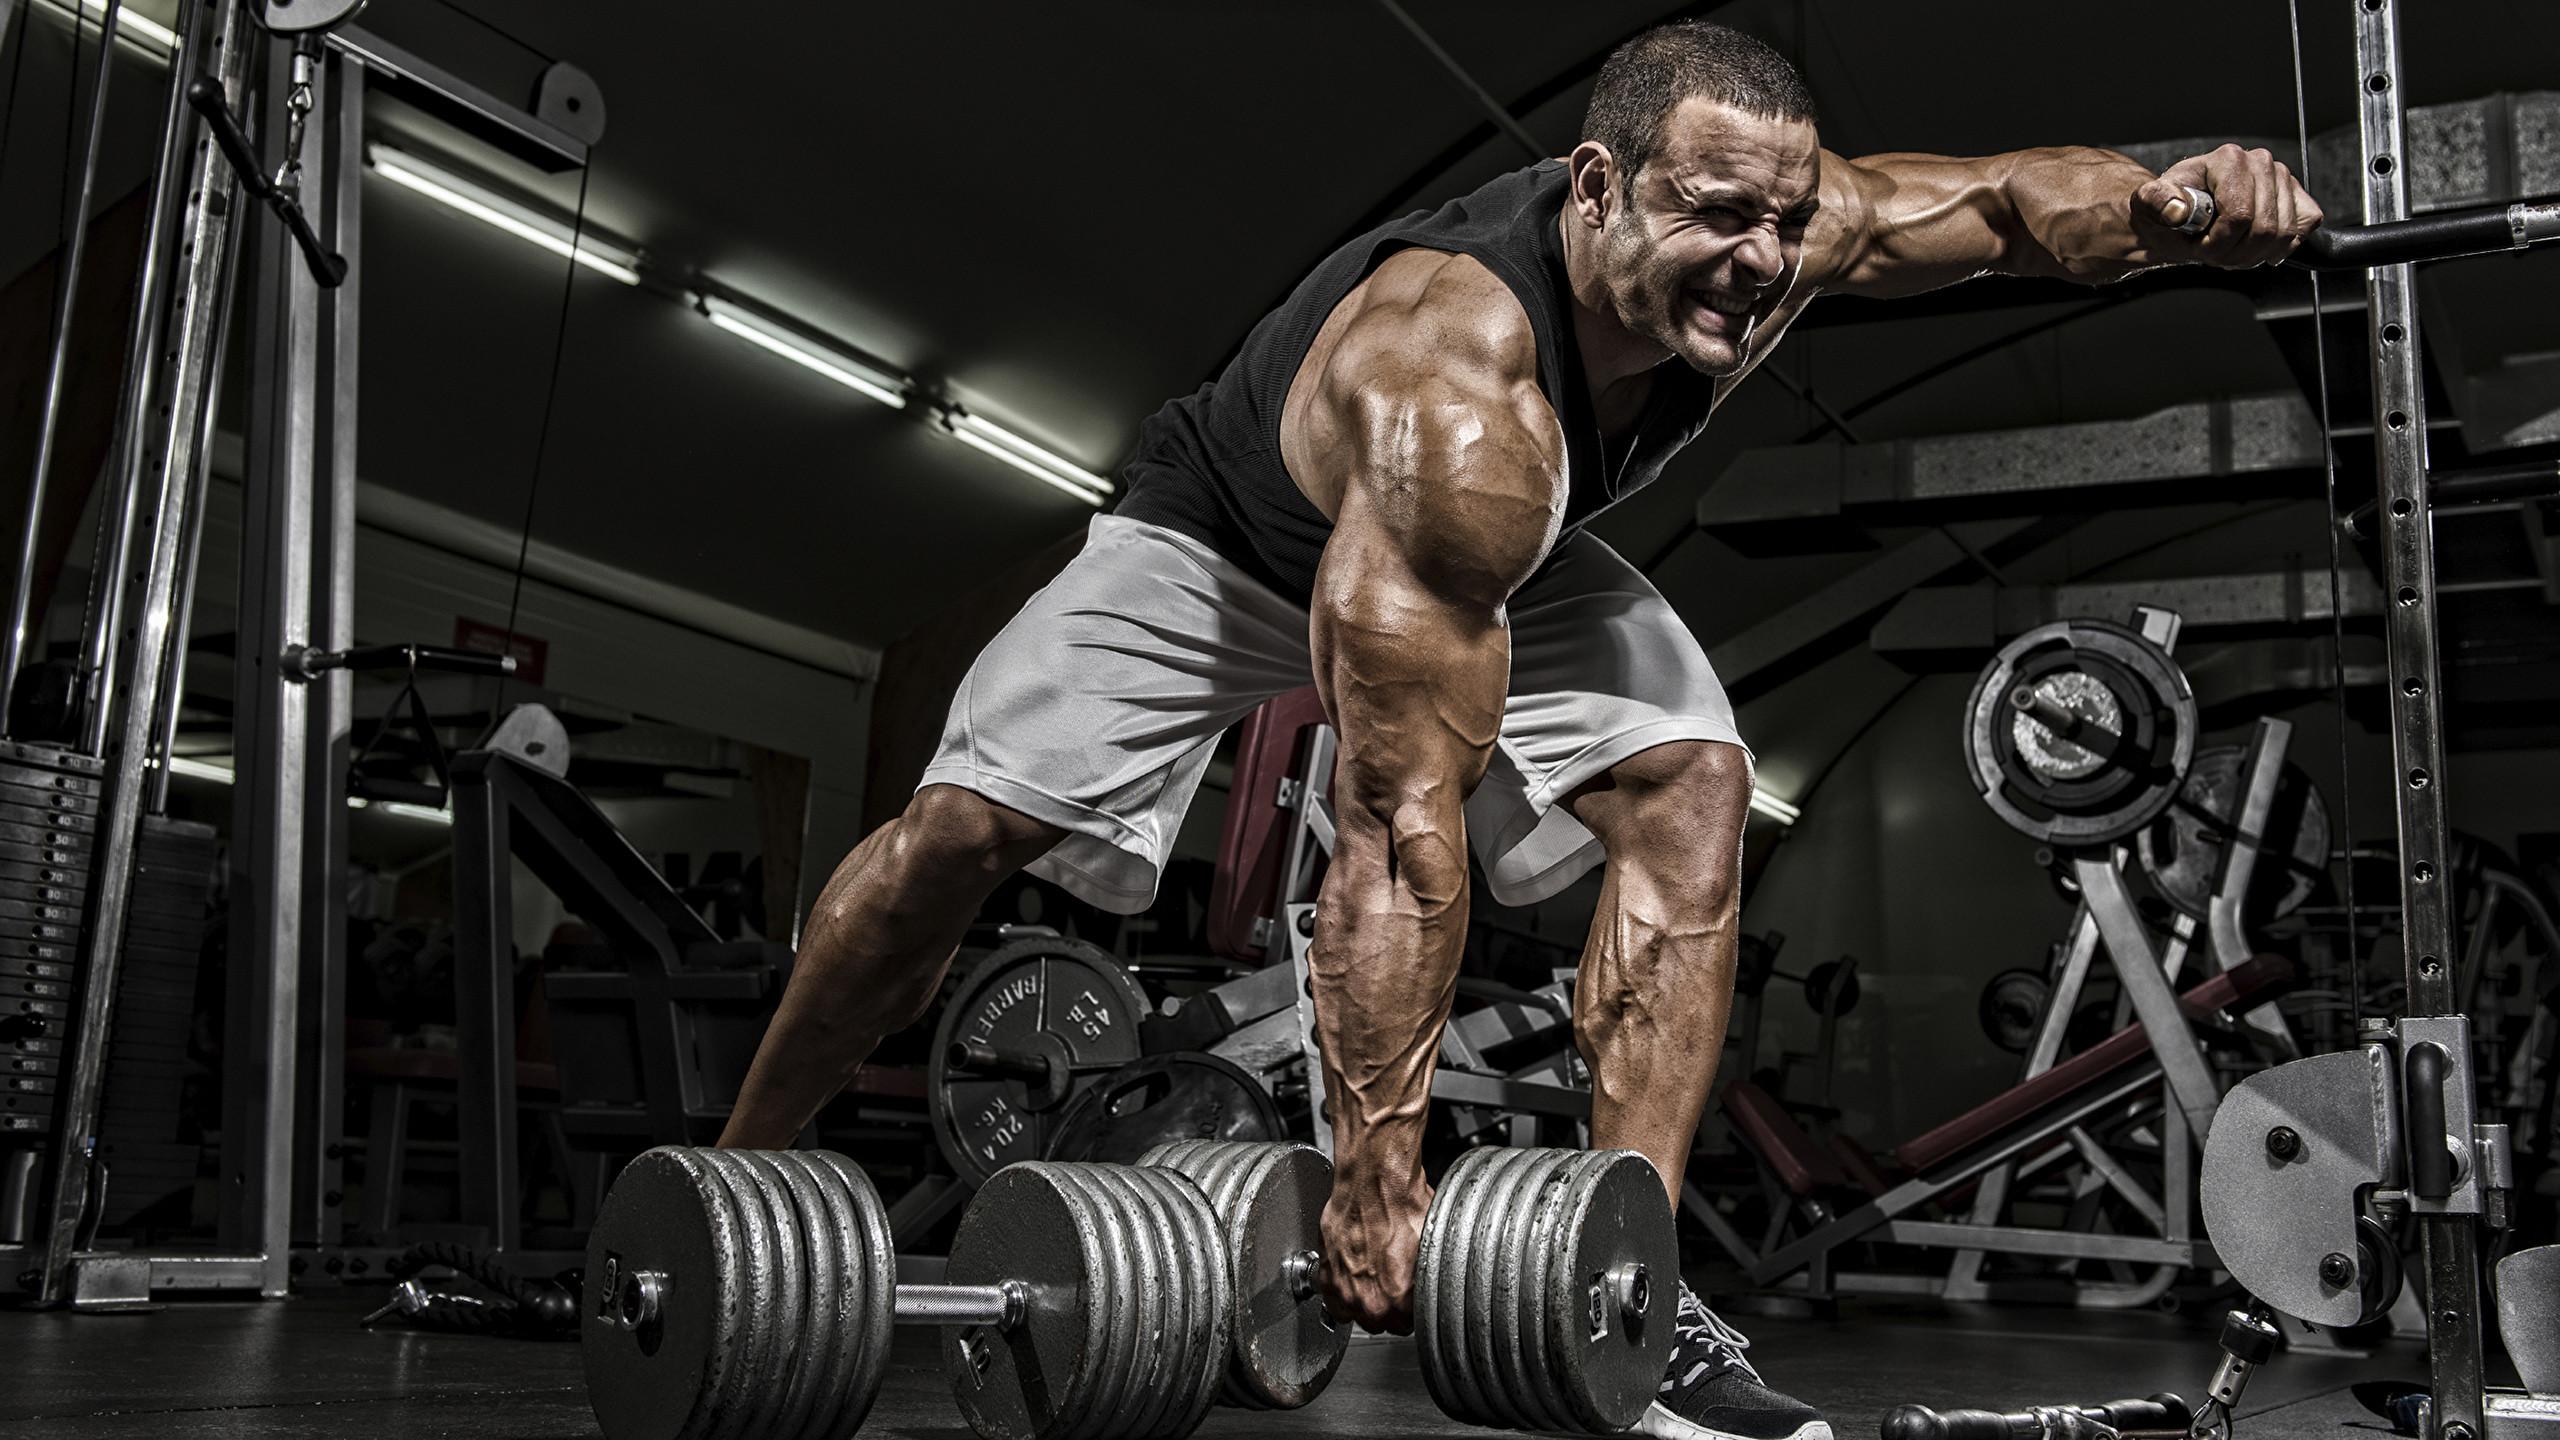 Wallpapers Man Gym Muscle Workout Sport Dumbbells Bodybuilding -  Bodybuilding - 2560x1440 - Download HD Wallpaper - WallpaperTip